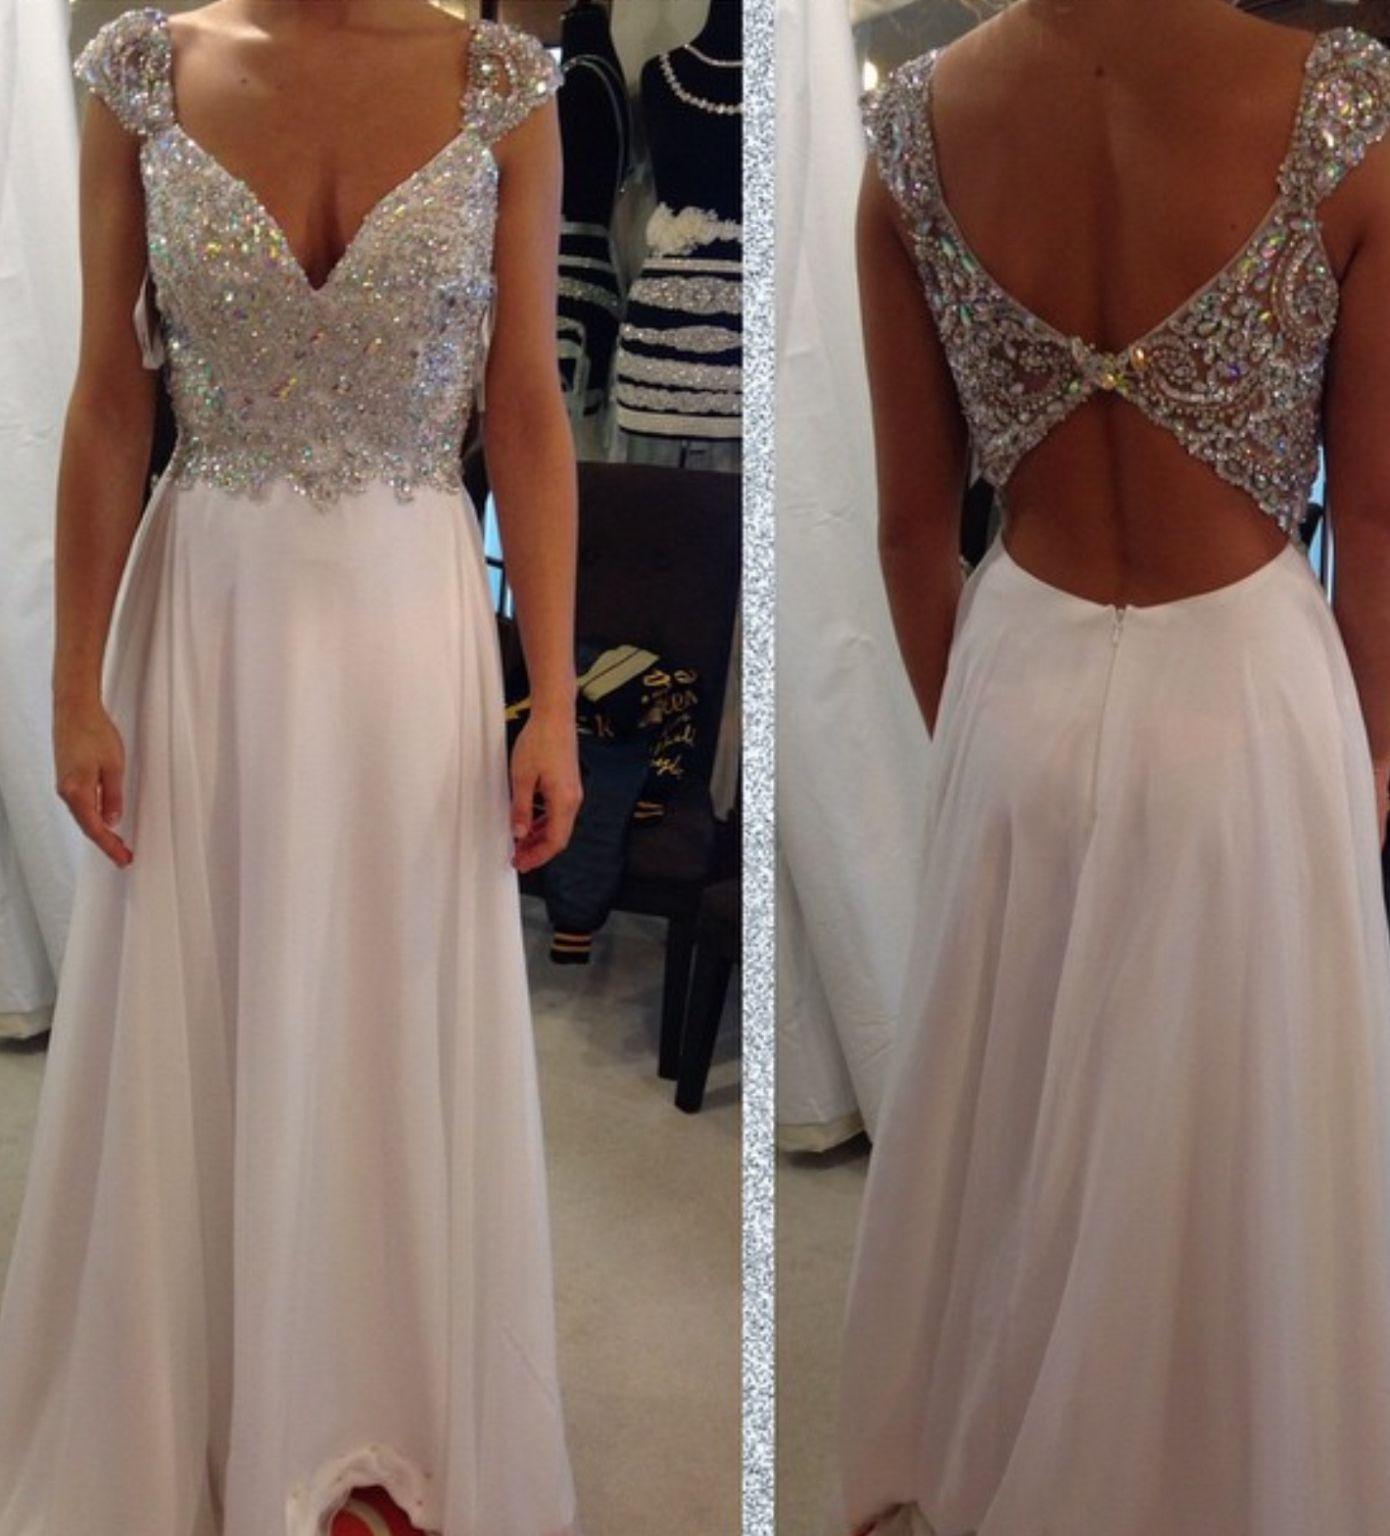 Prom dress formal dress long sleeve dress long dress chiffon